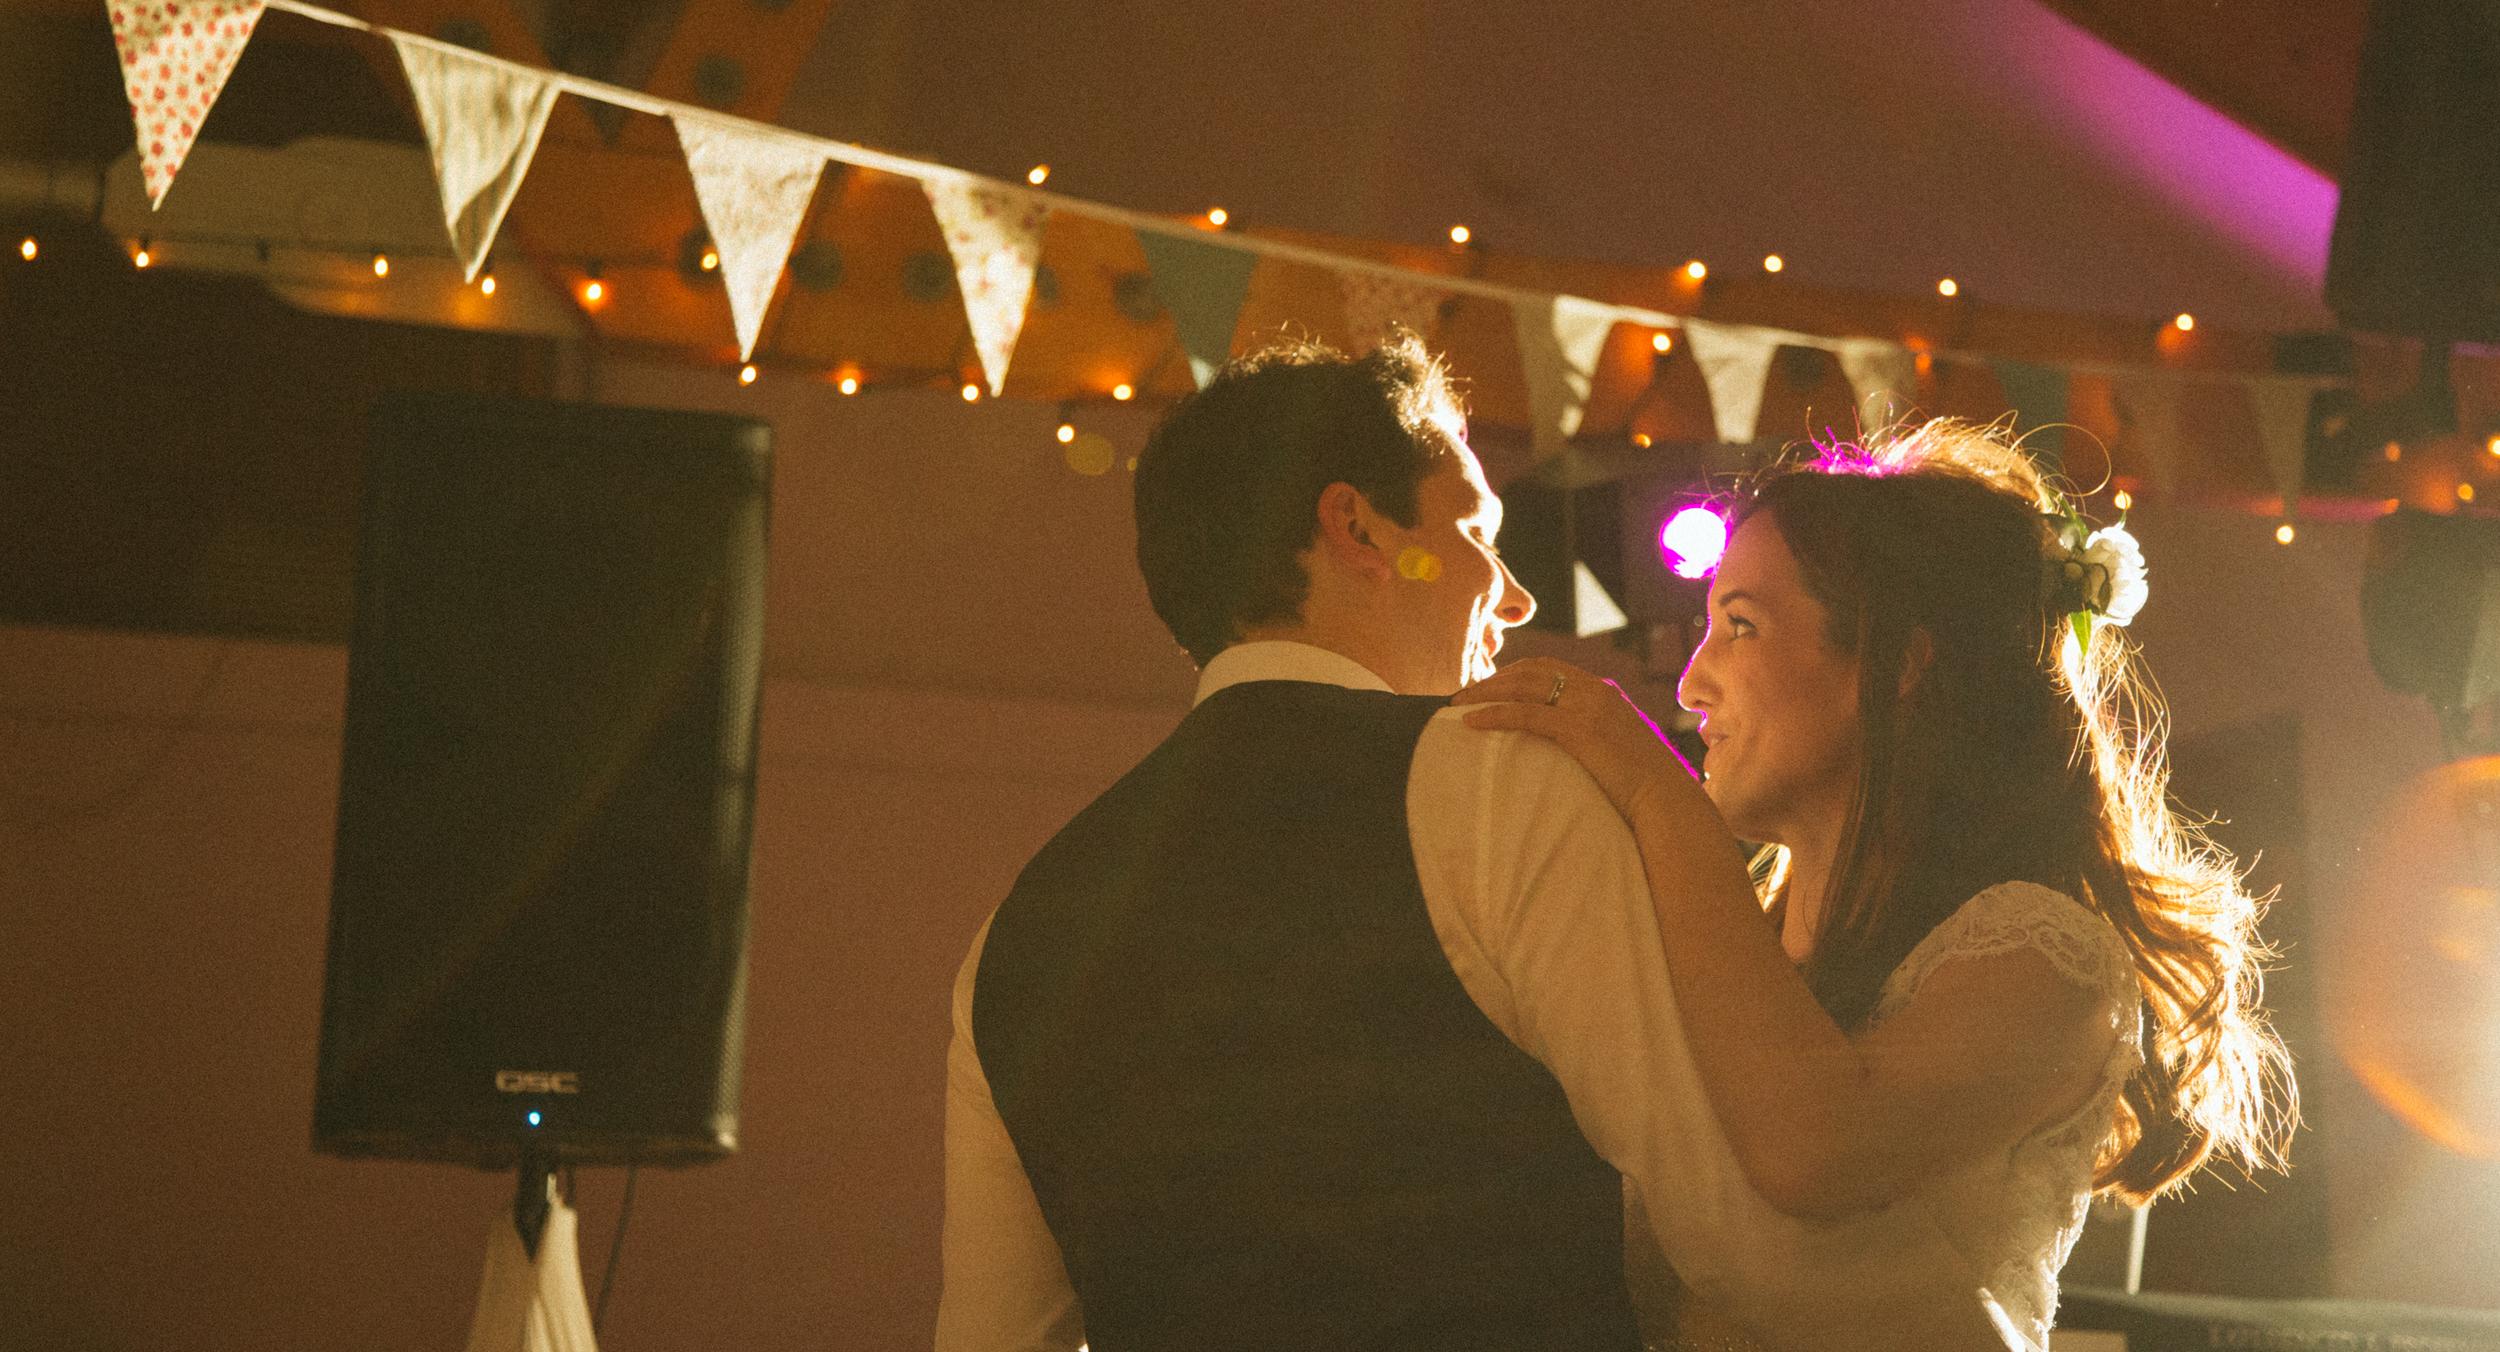 barnes-wedding-wetland-centre-3-first-dance-london-uk-destination-wedding-photography-Adam-Rowley